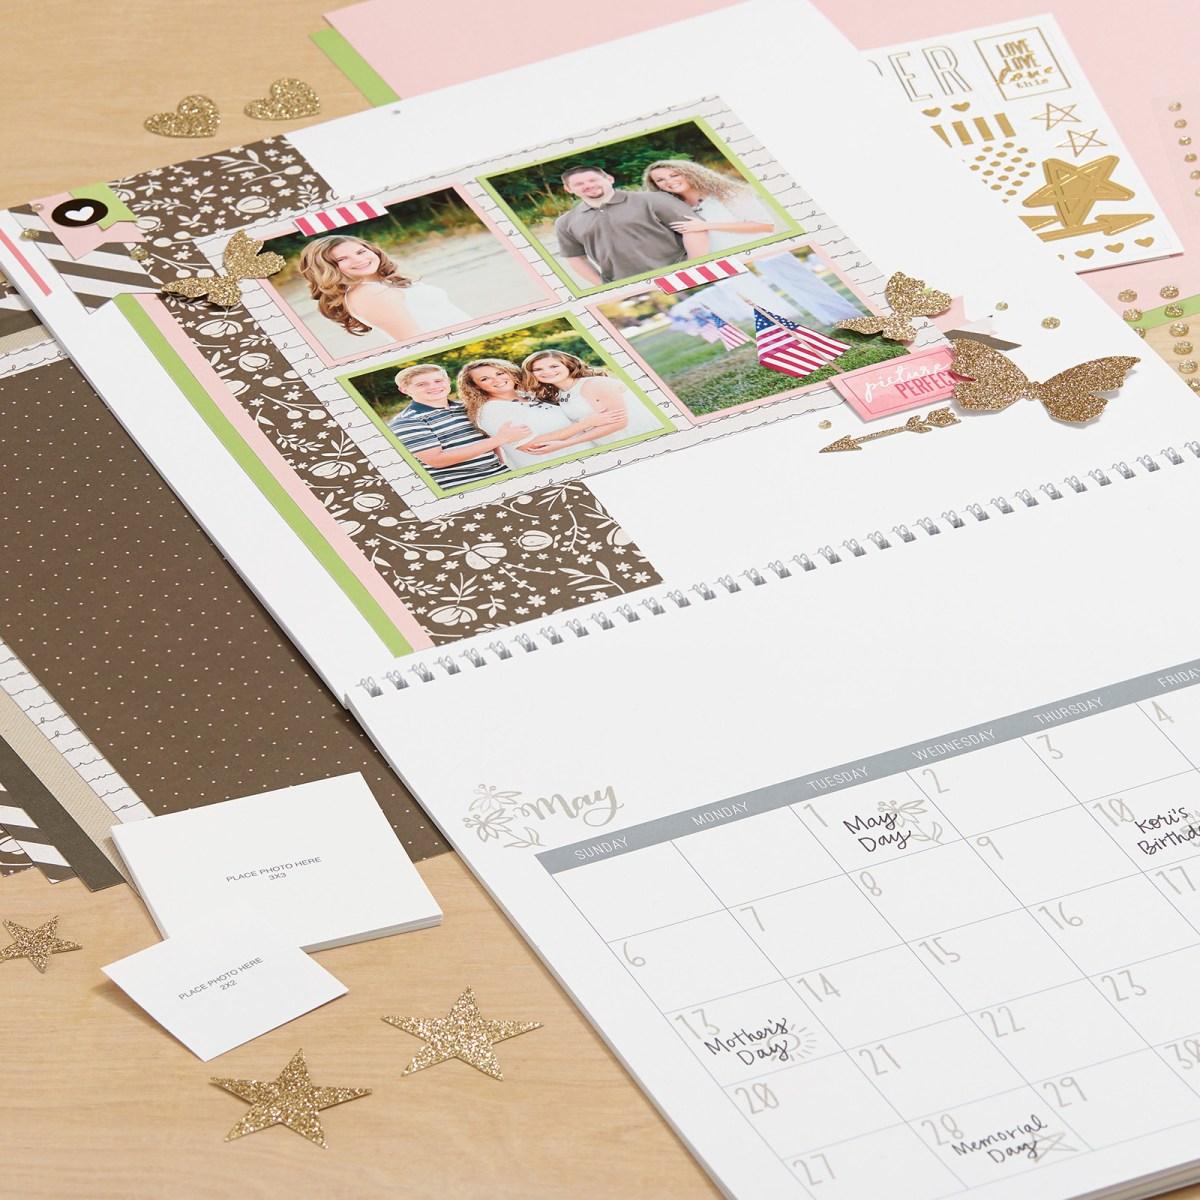 Through the Year #ctmh #closetomyheart #throughtheyear #stamp #November #stampofthemonth #sotm #calendar #kit